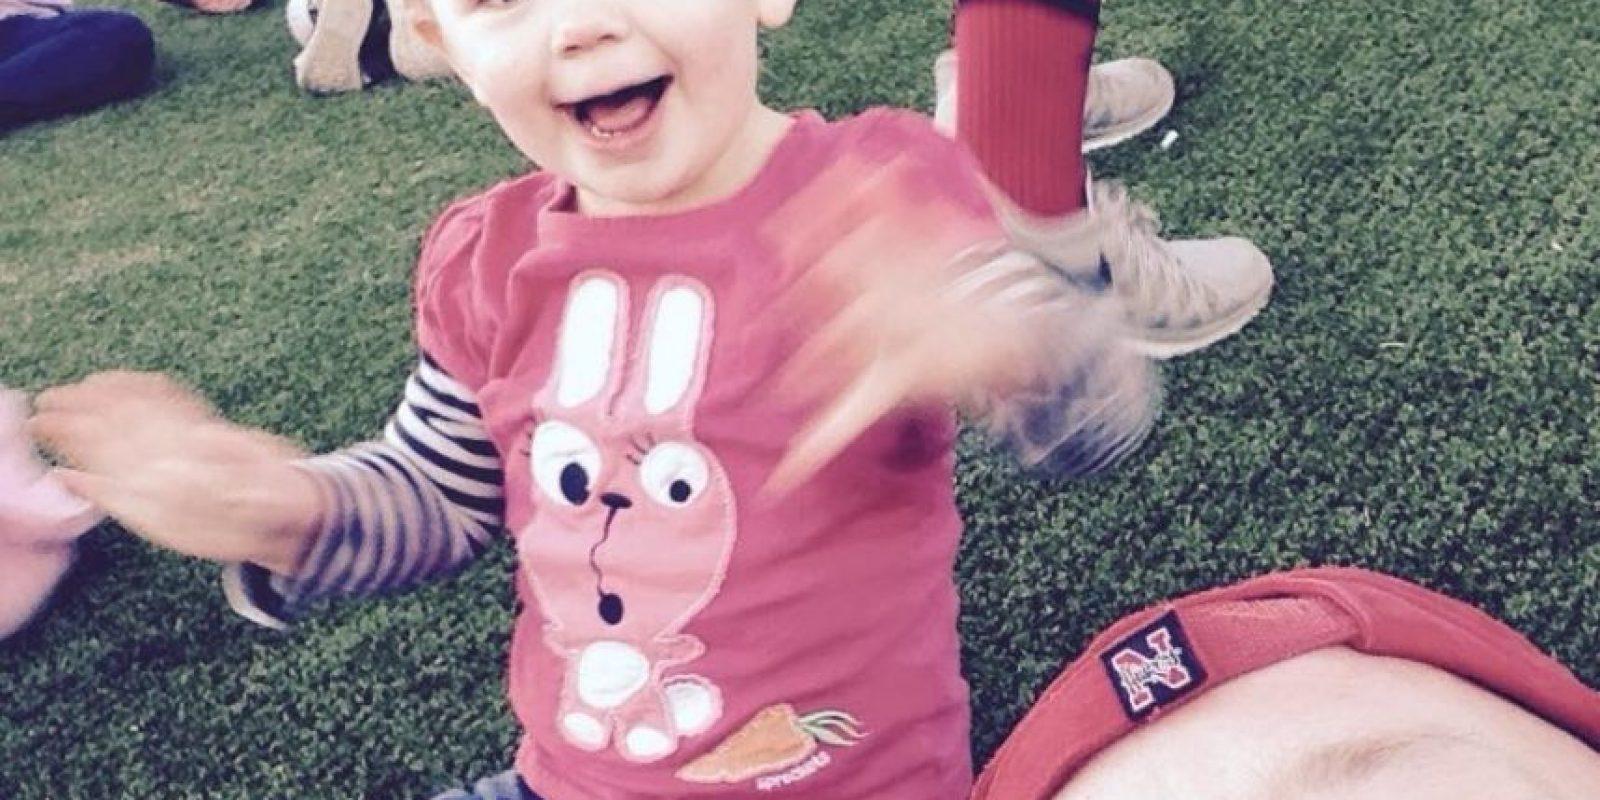 Greg Wickherst tiene una hija de 3 años, Izzy. Foto:Facebook/Greg Wickherst